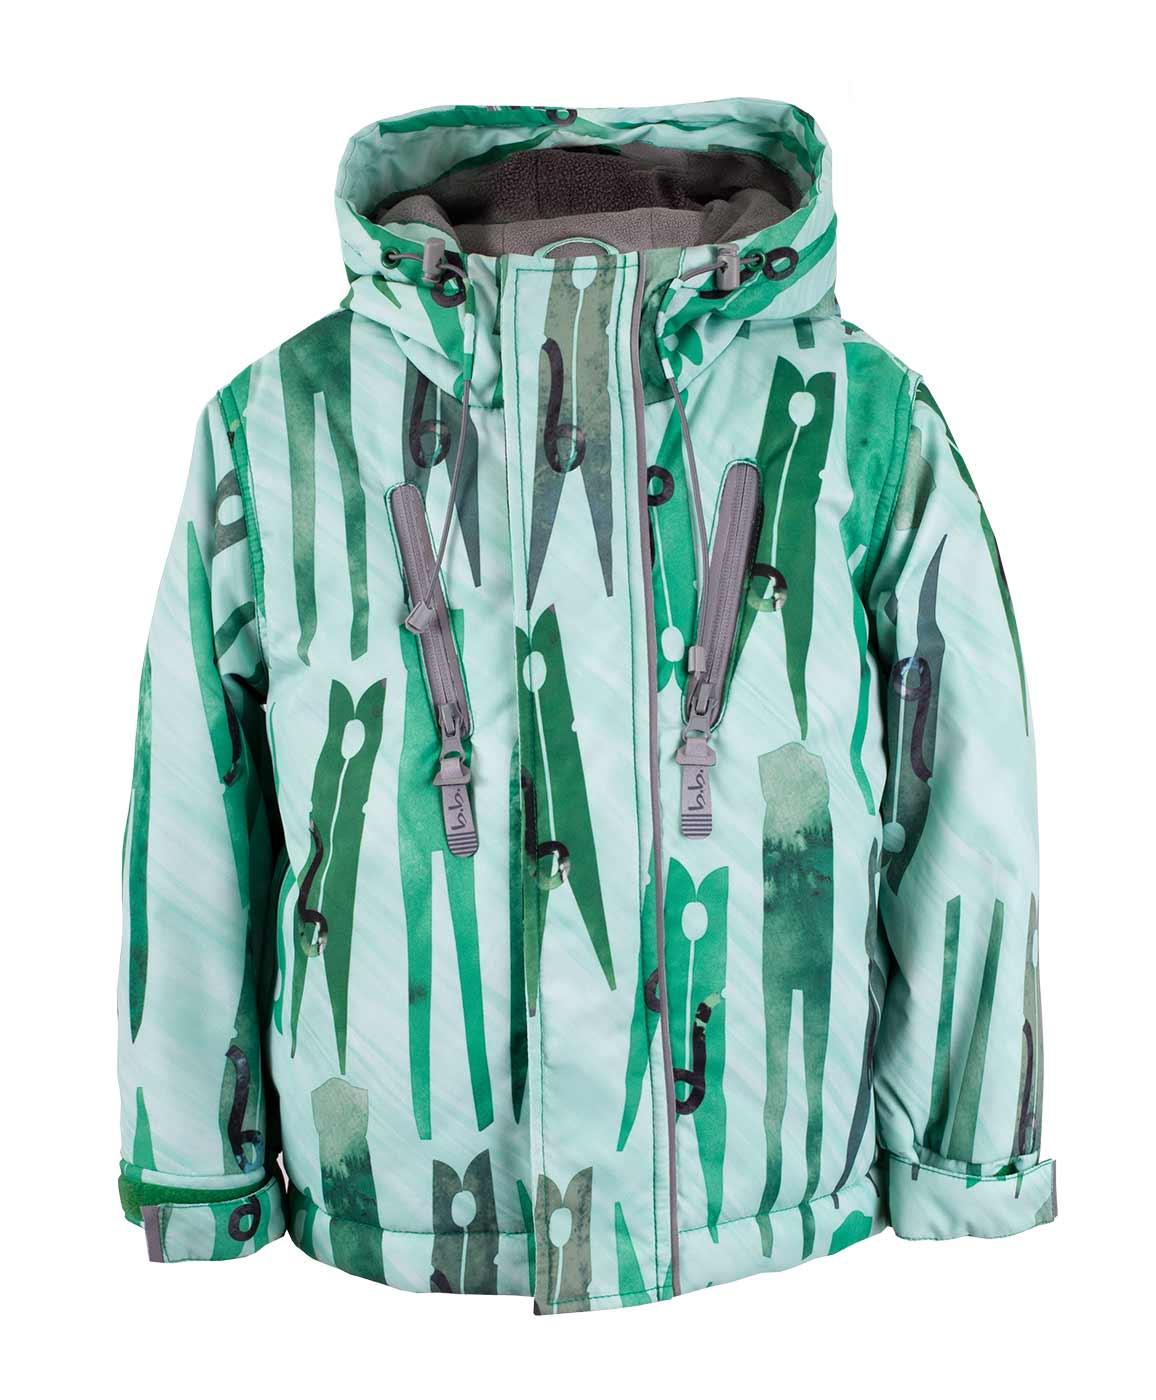 Купить 117BBBA41012813, Куртка Button Blue, BUTTON BLUE Active, зеленый, 134, Мужской, ОСЕНЬ/ЗИМА 2017-2018 (shop: GulliverMarket Gulliver Market)